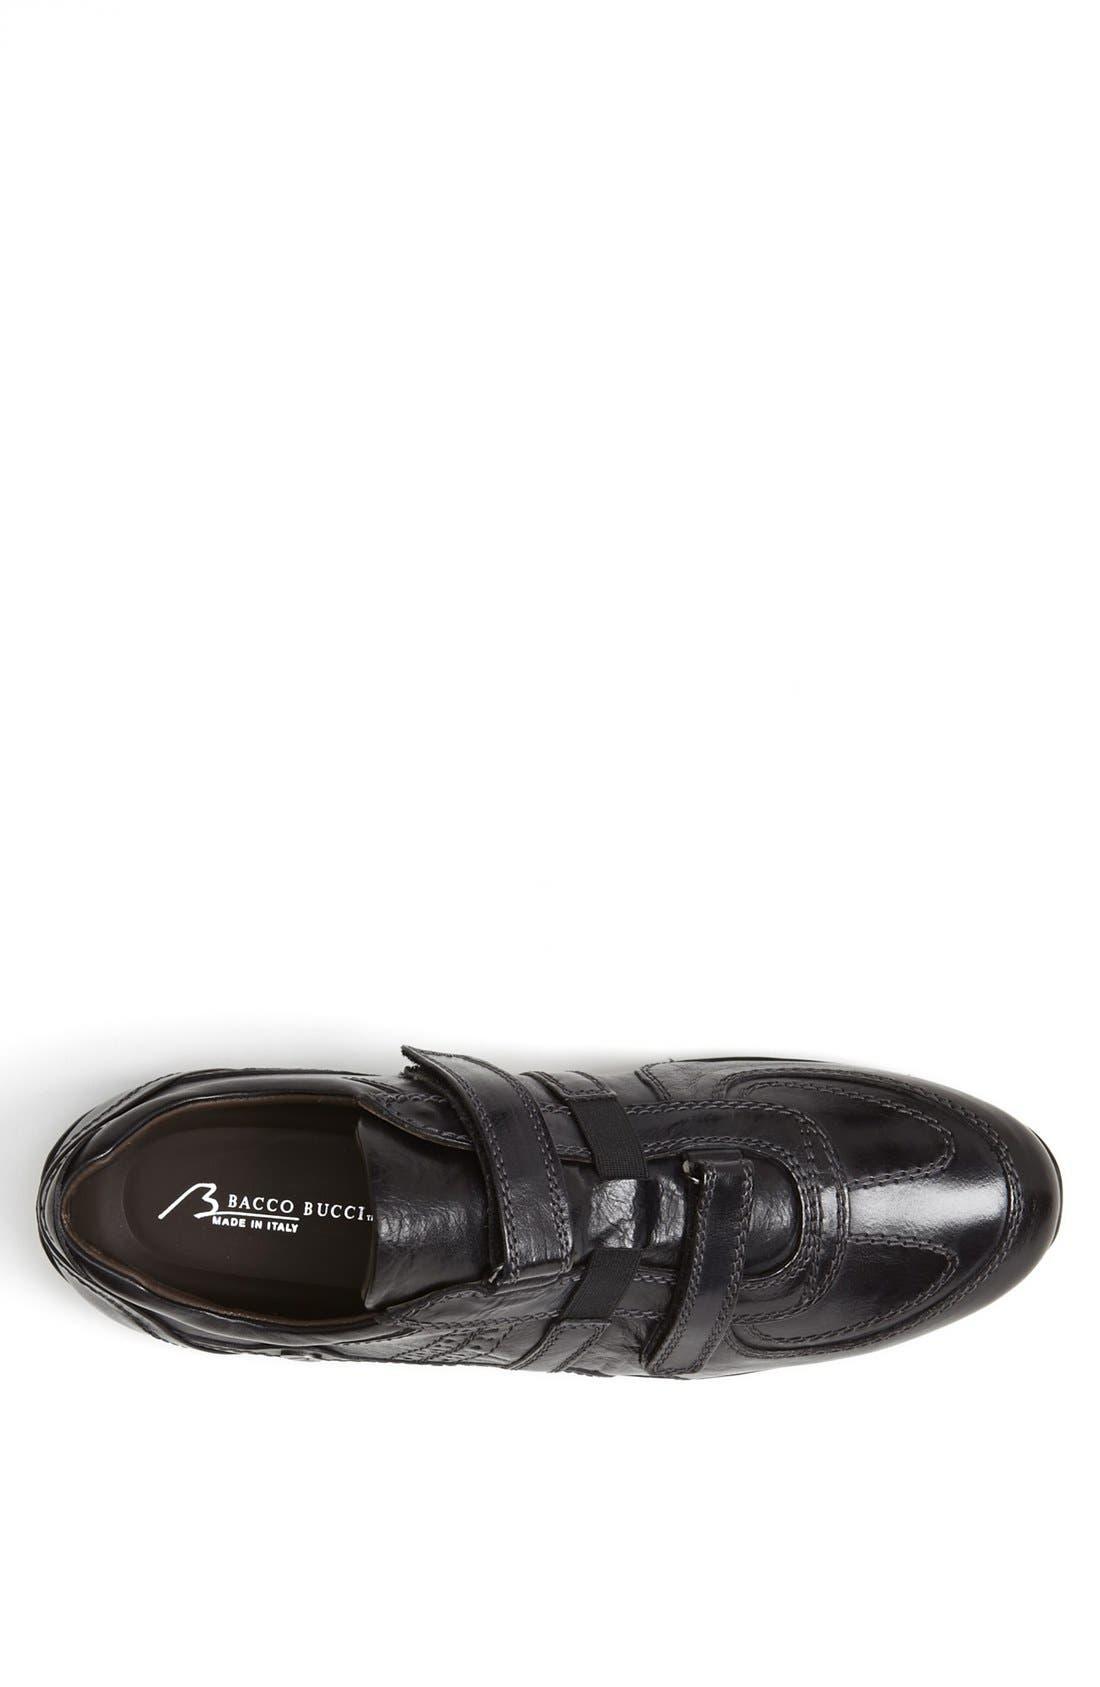 Alternate Image 3  - Bacco Bucci 'Punto' Sneaker